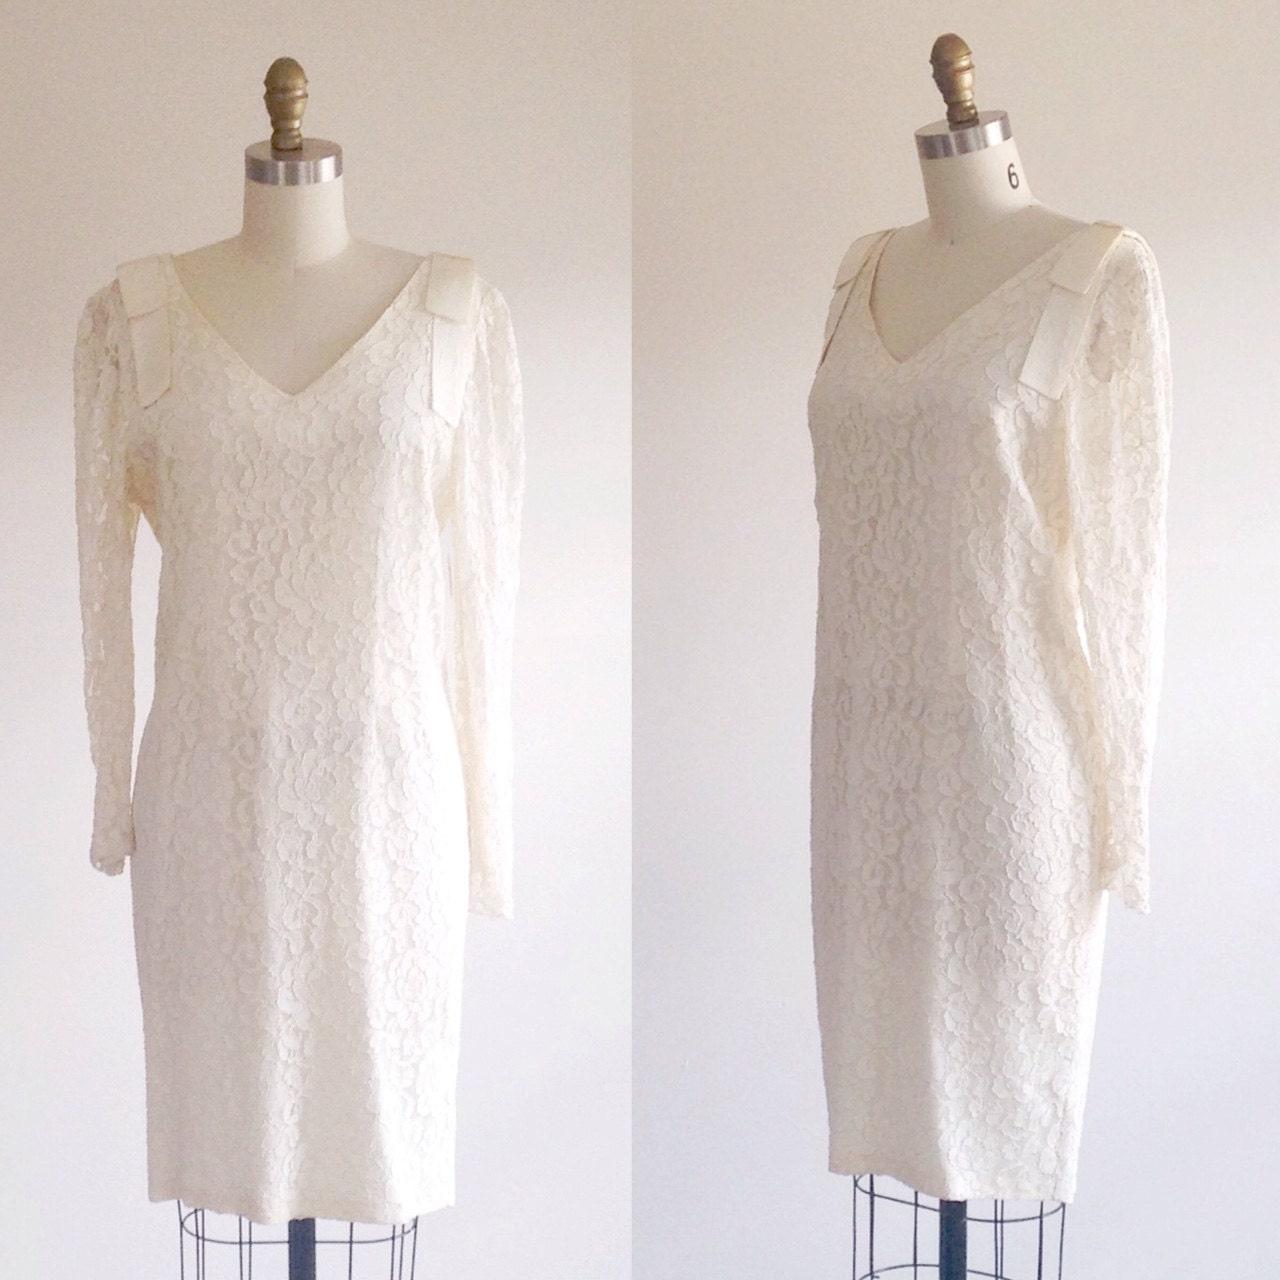 Lace wedding dress simple wedding dress ivory wedding dress for Simple ivory wedding dresses